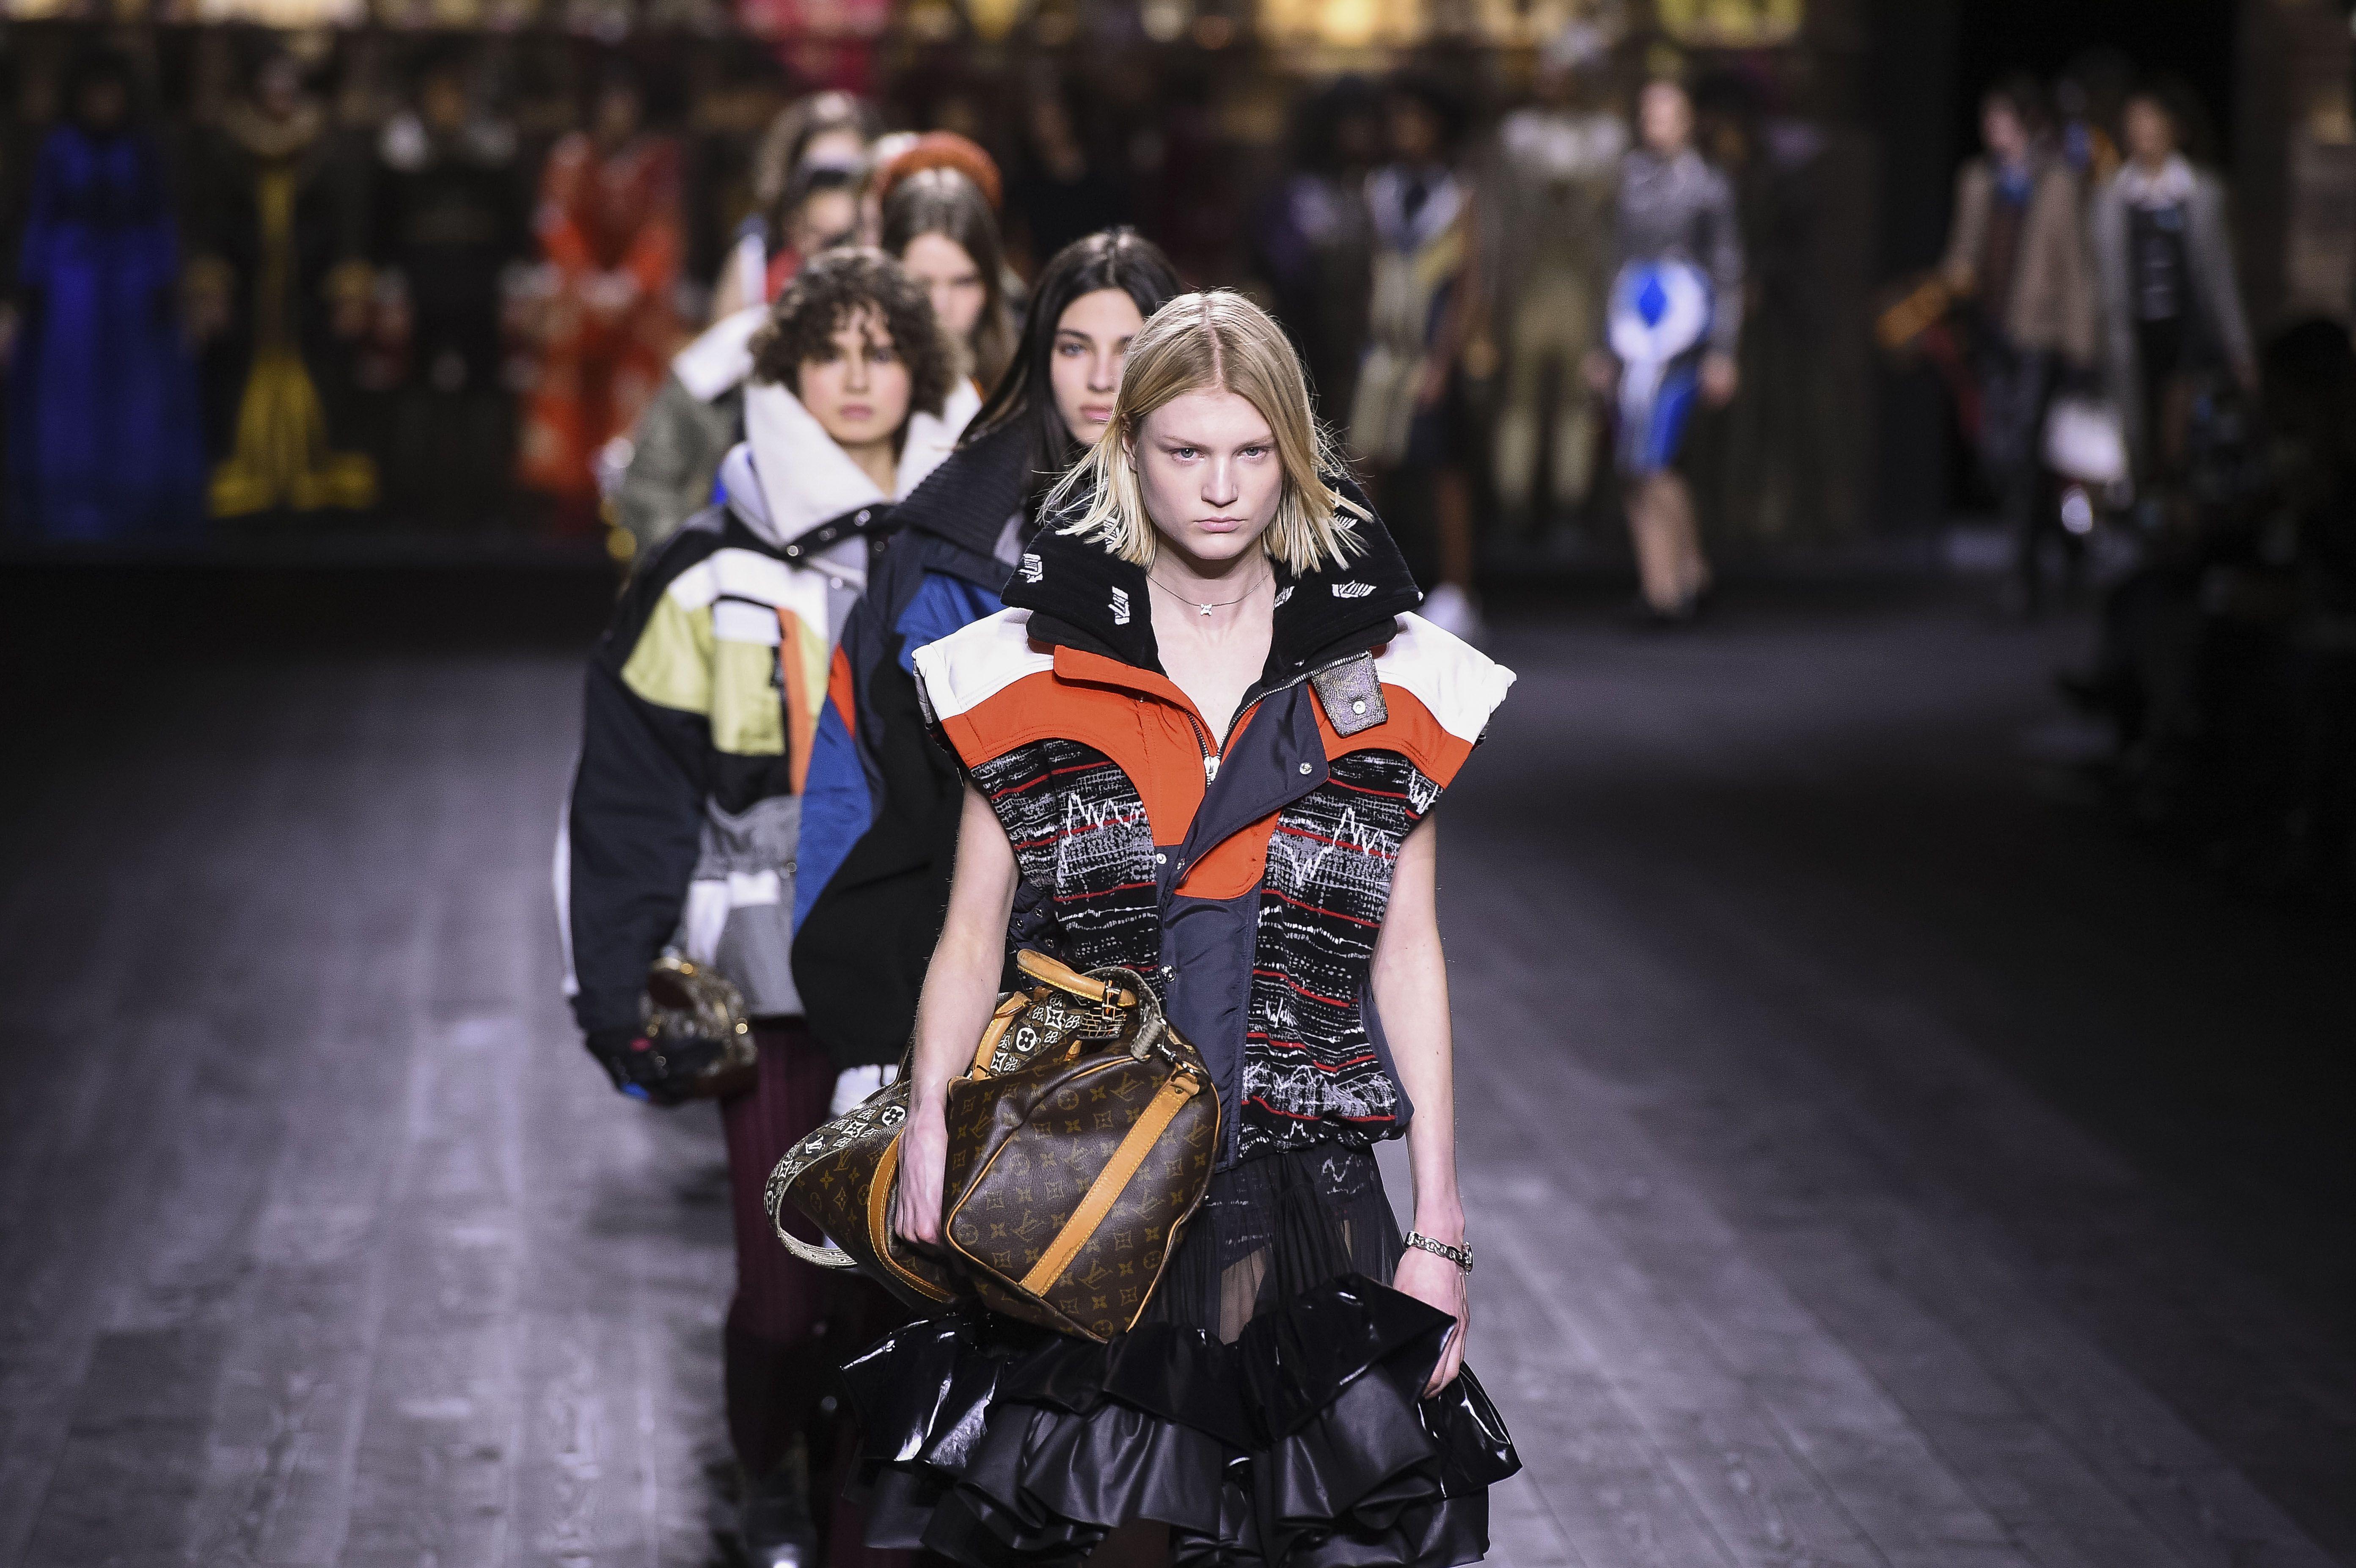 Models on the catwalk Louis Vuitton show.